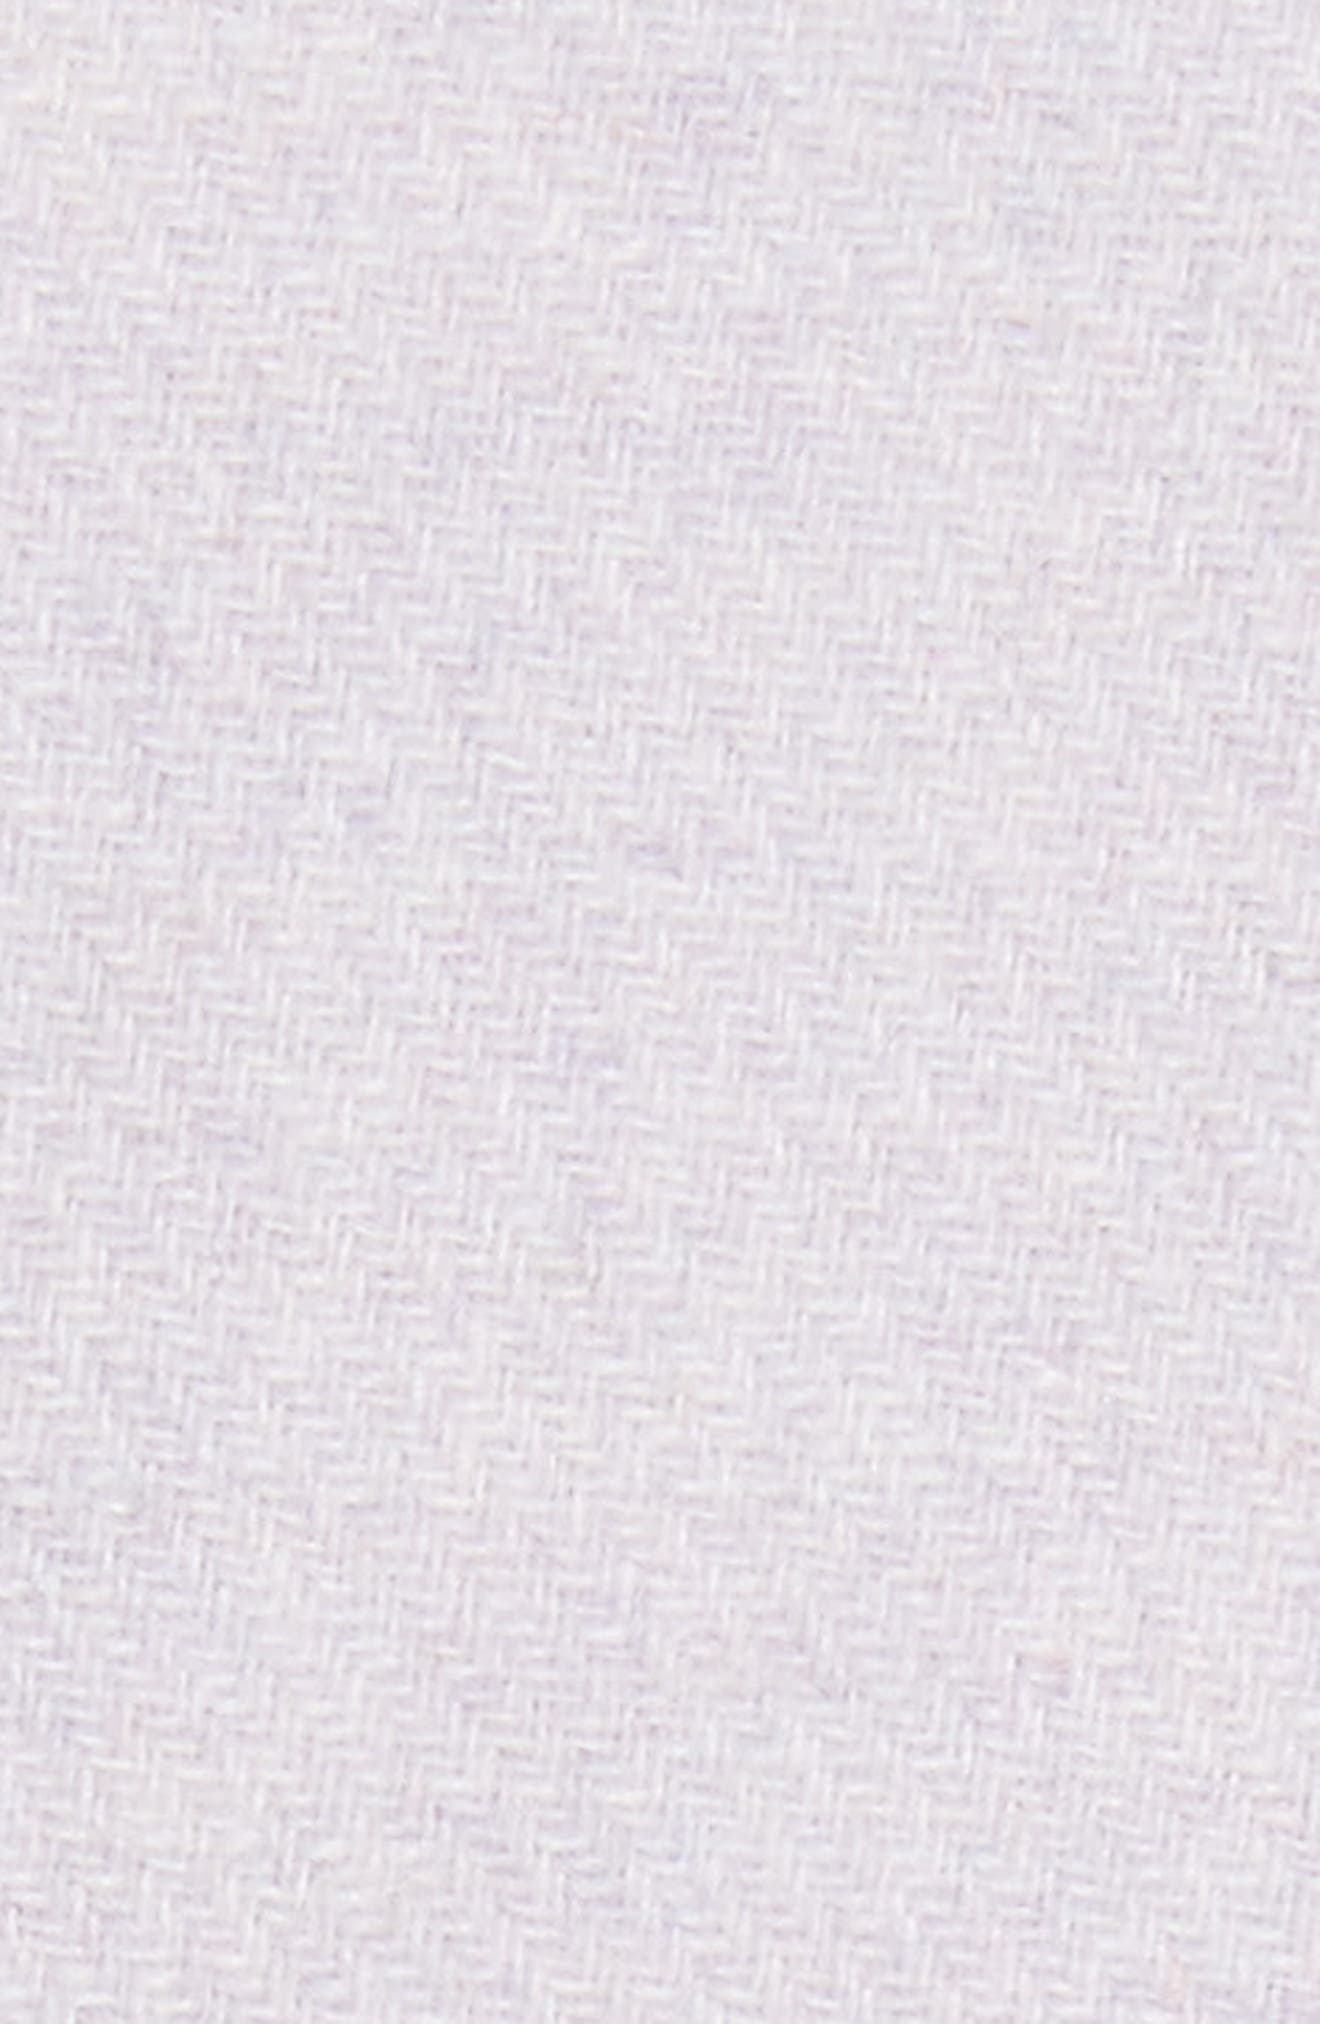 Wool Blend Melton Coat,                             Alternate thumbnail 5, color,                             Dusty Lavender